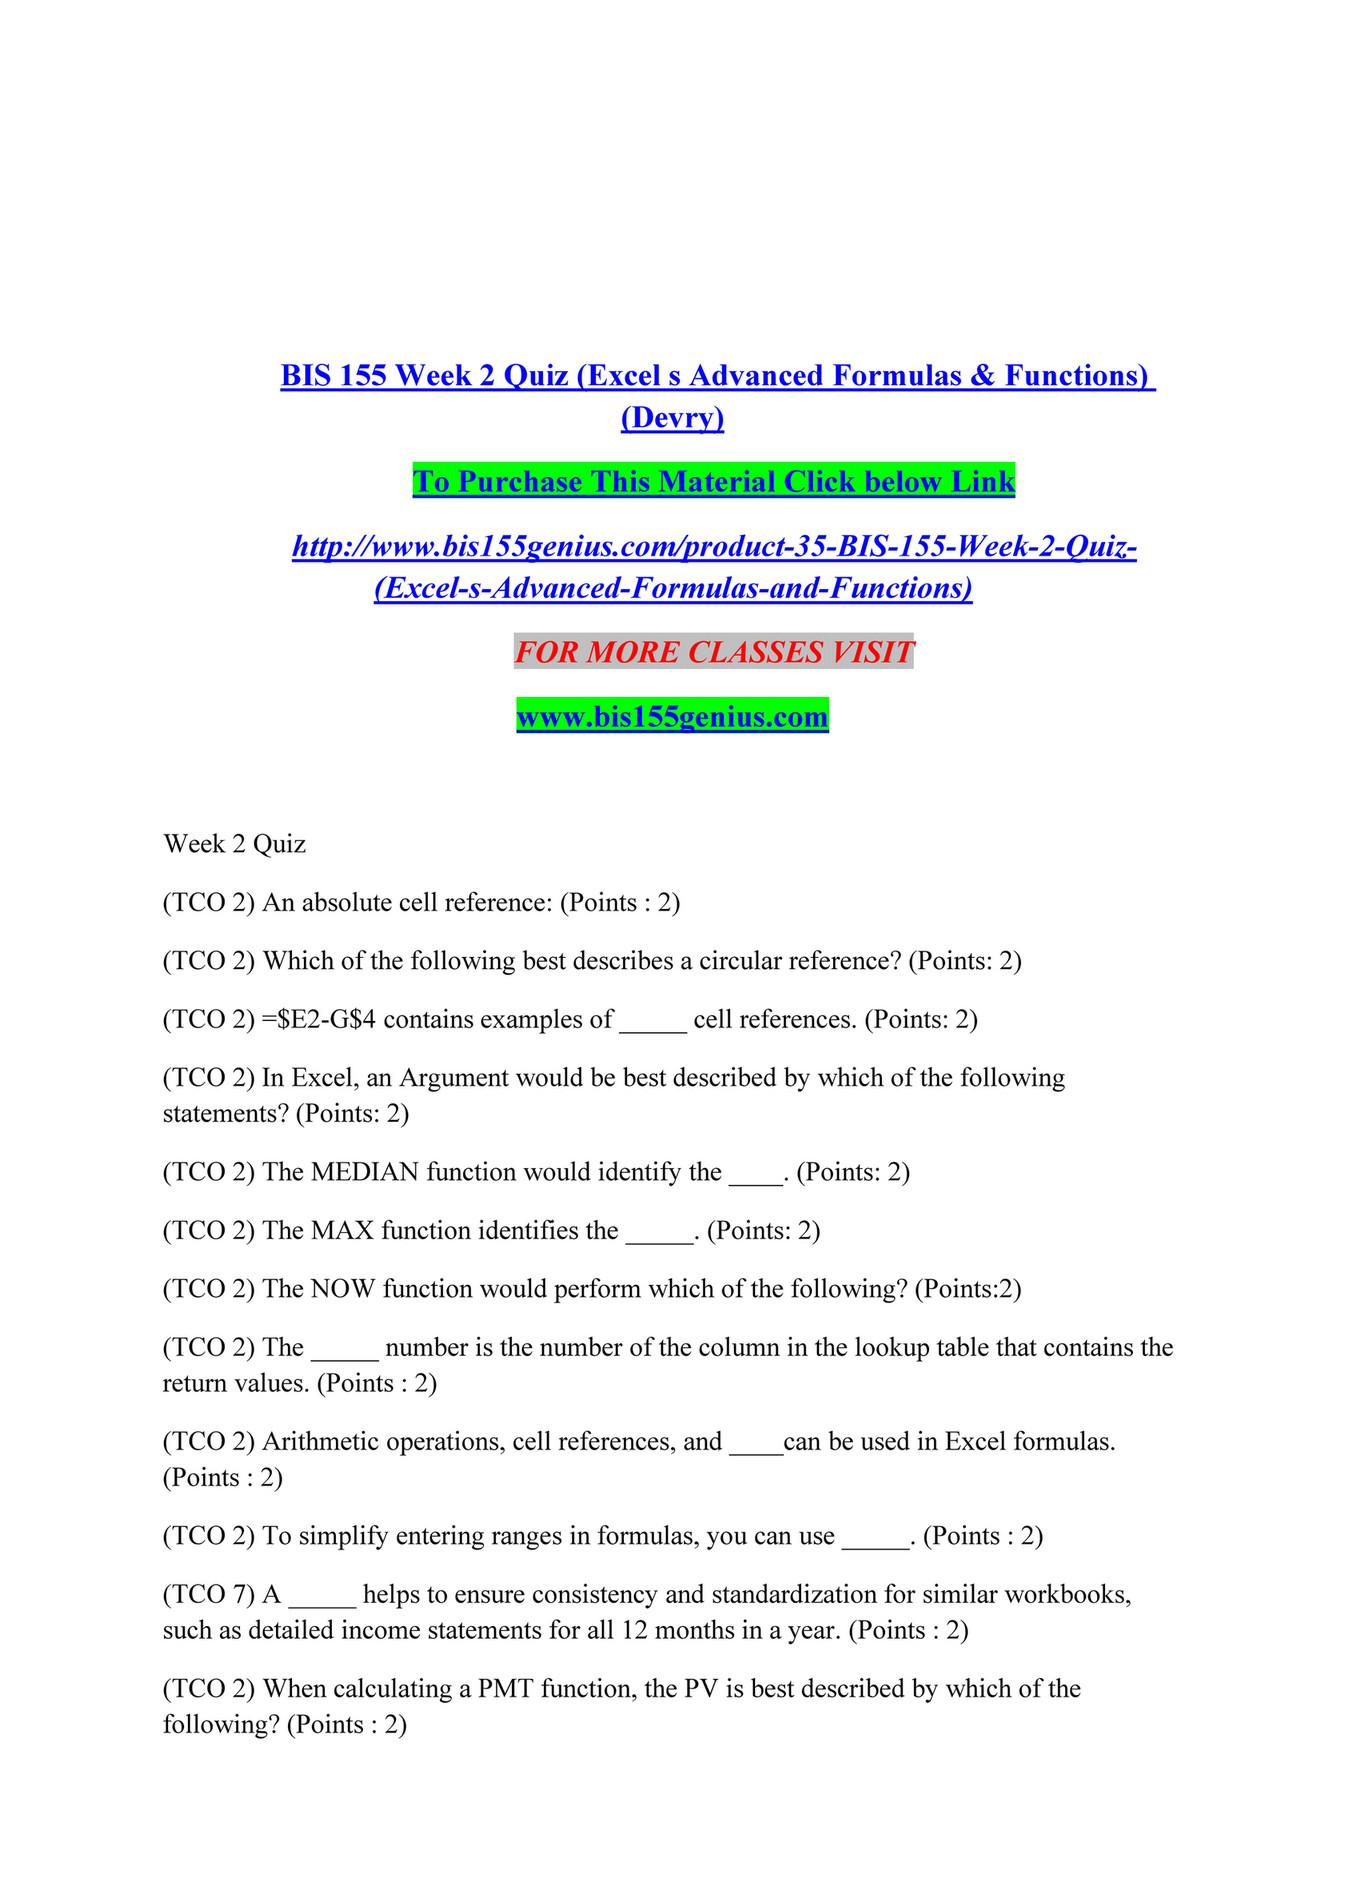 kanha   BIS 200 Week 20 Quiz Excel s Advanced Formulas & Functions ...